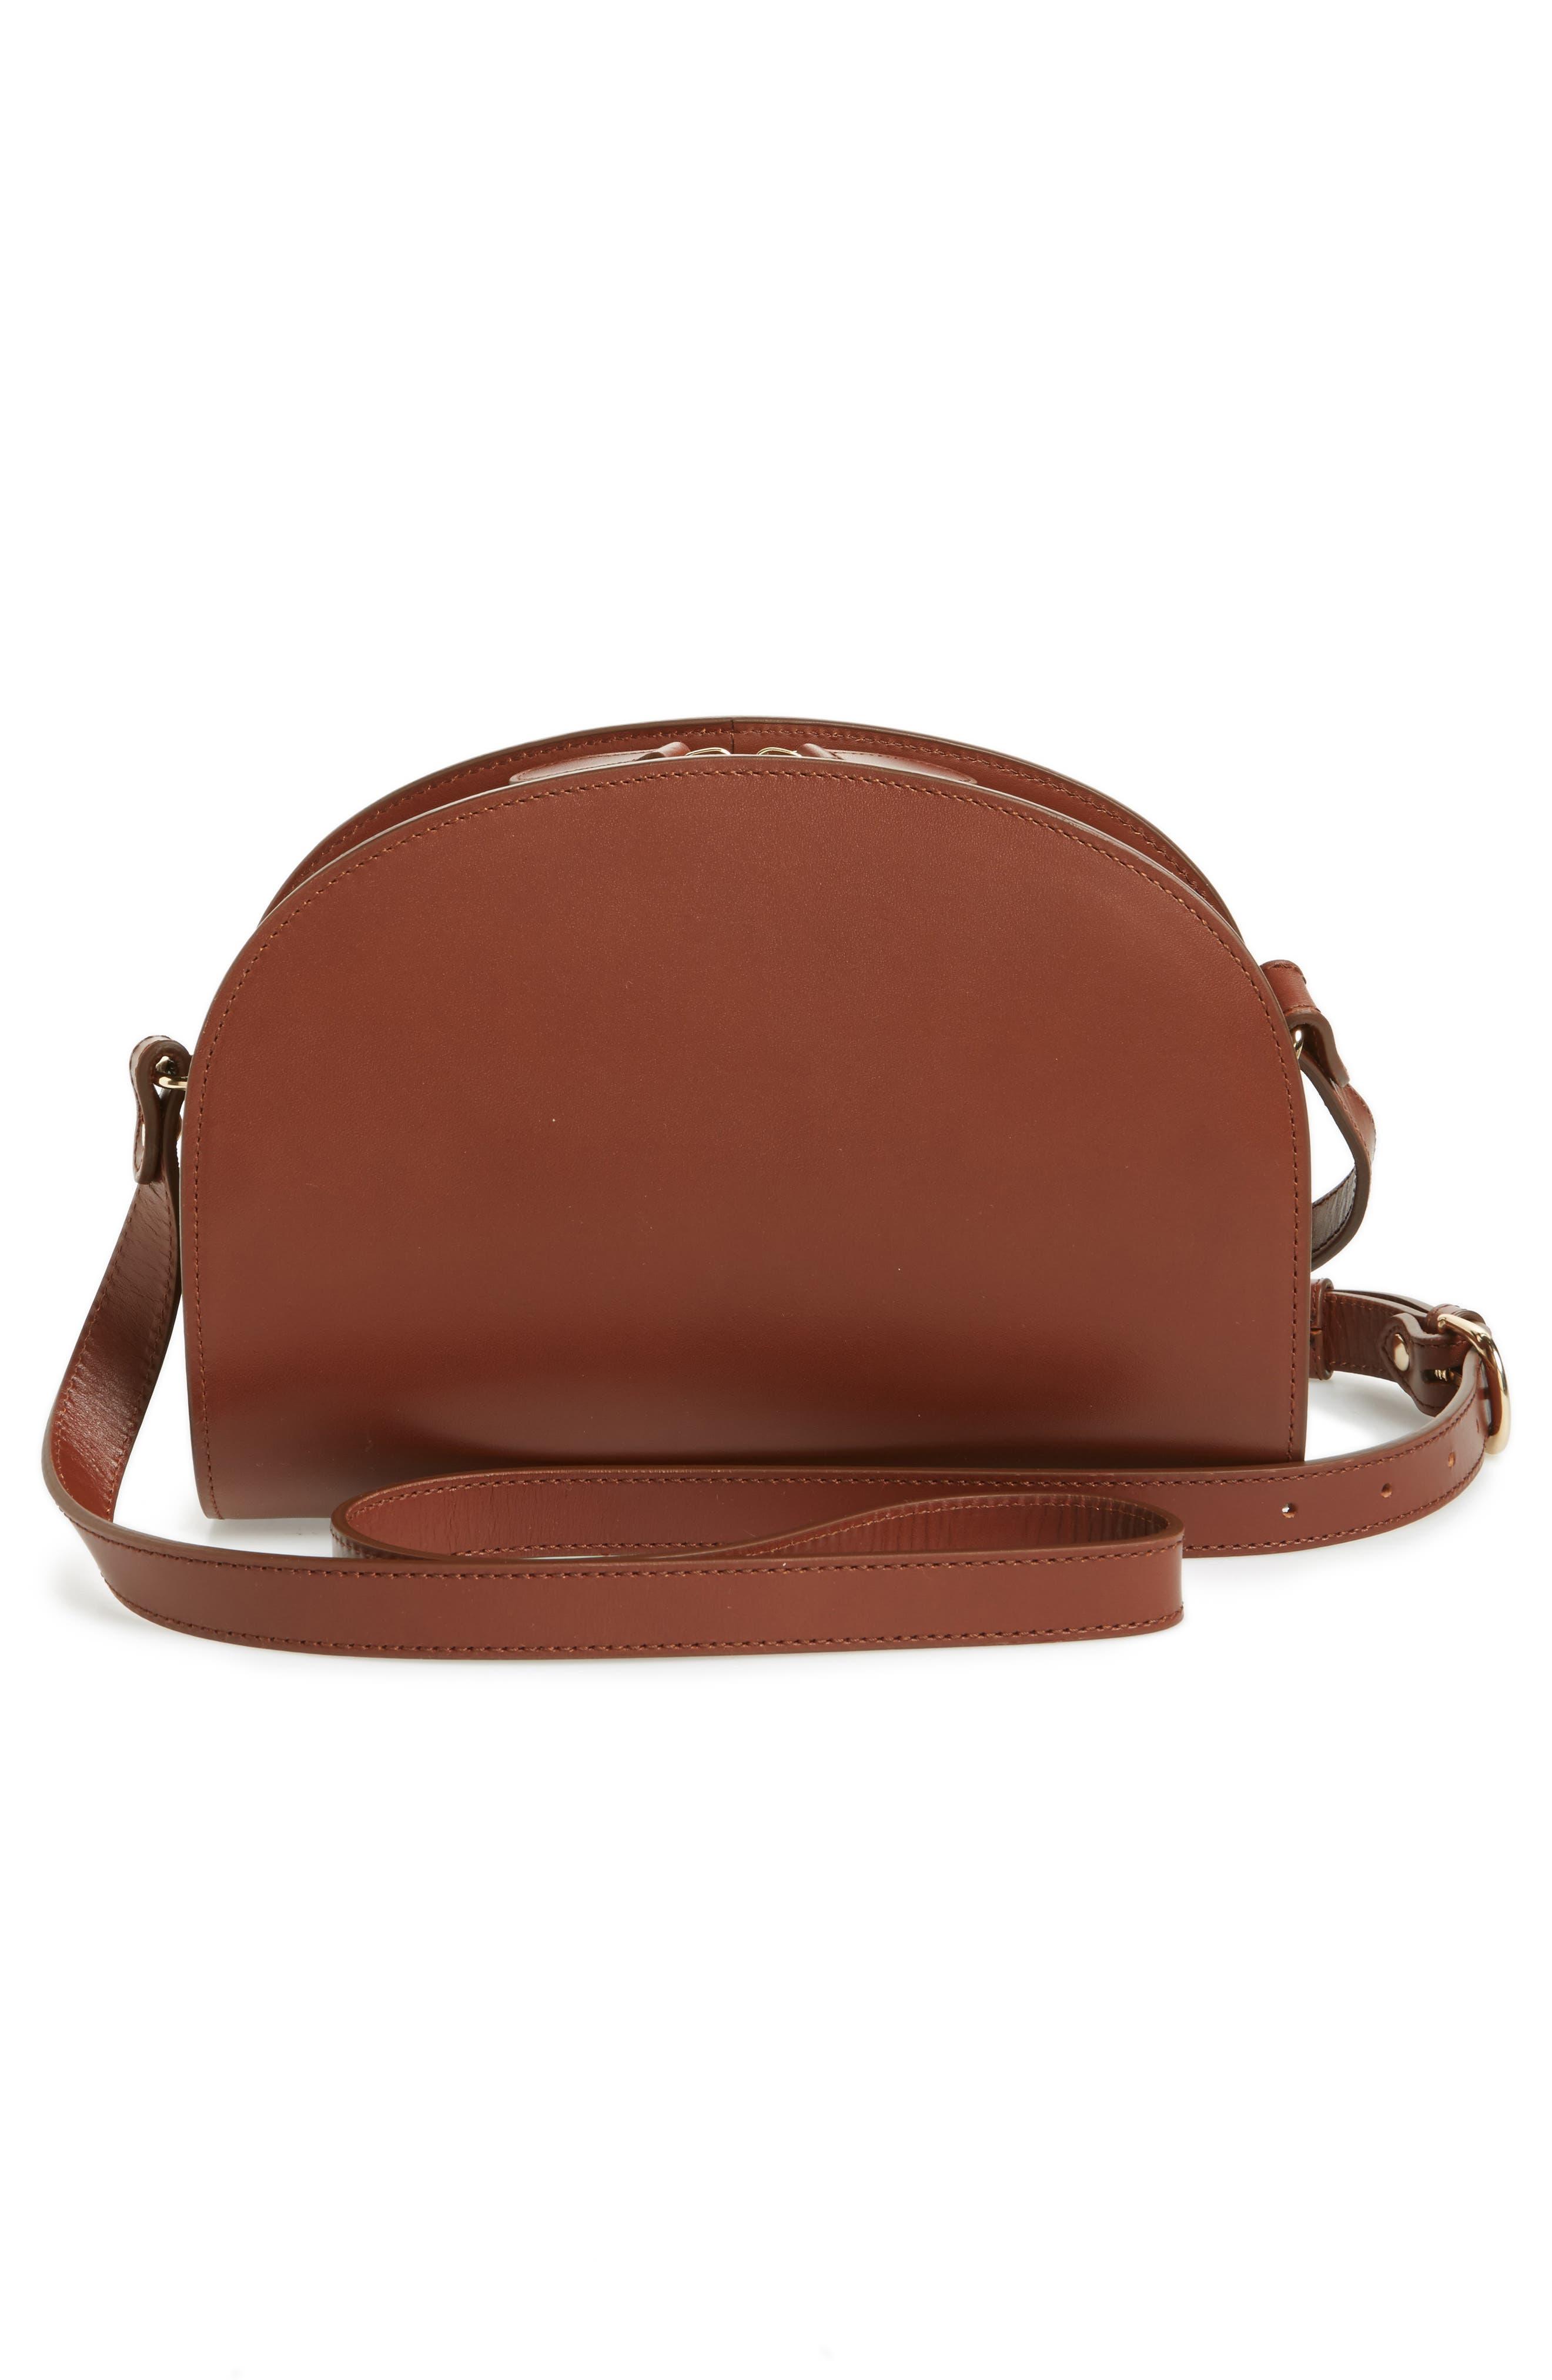 'Sac Demi Lune' Leather Crossbody Bag,                             Alternate thumbnail 3, color,                             NOISETTE